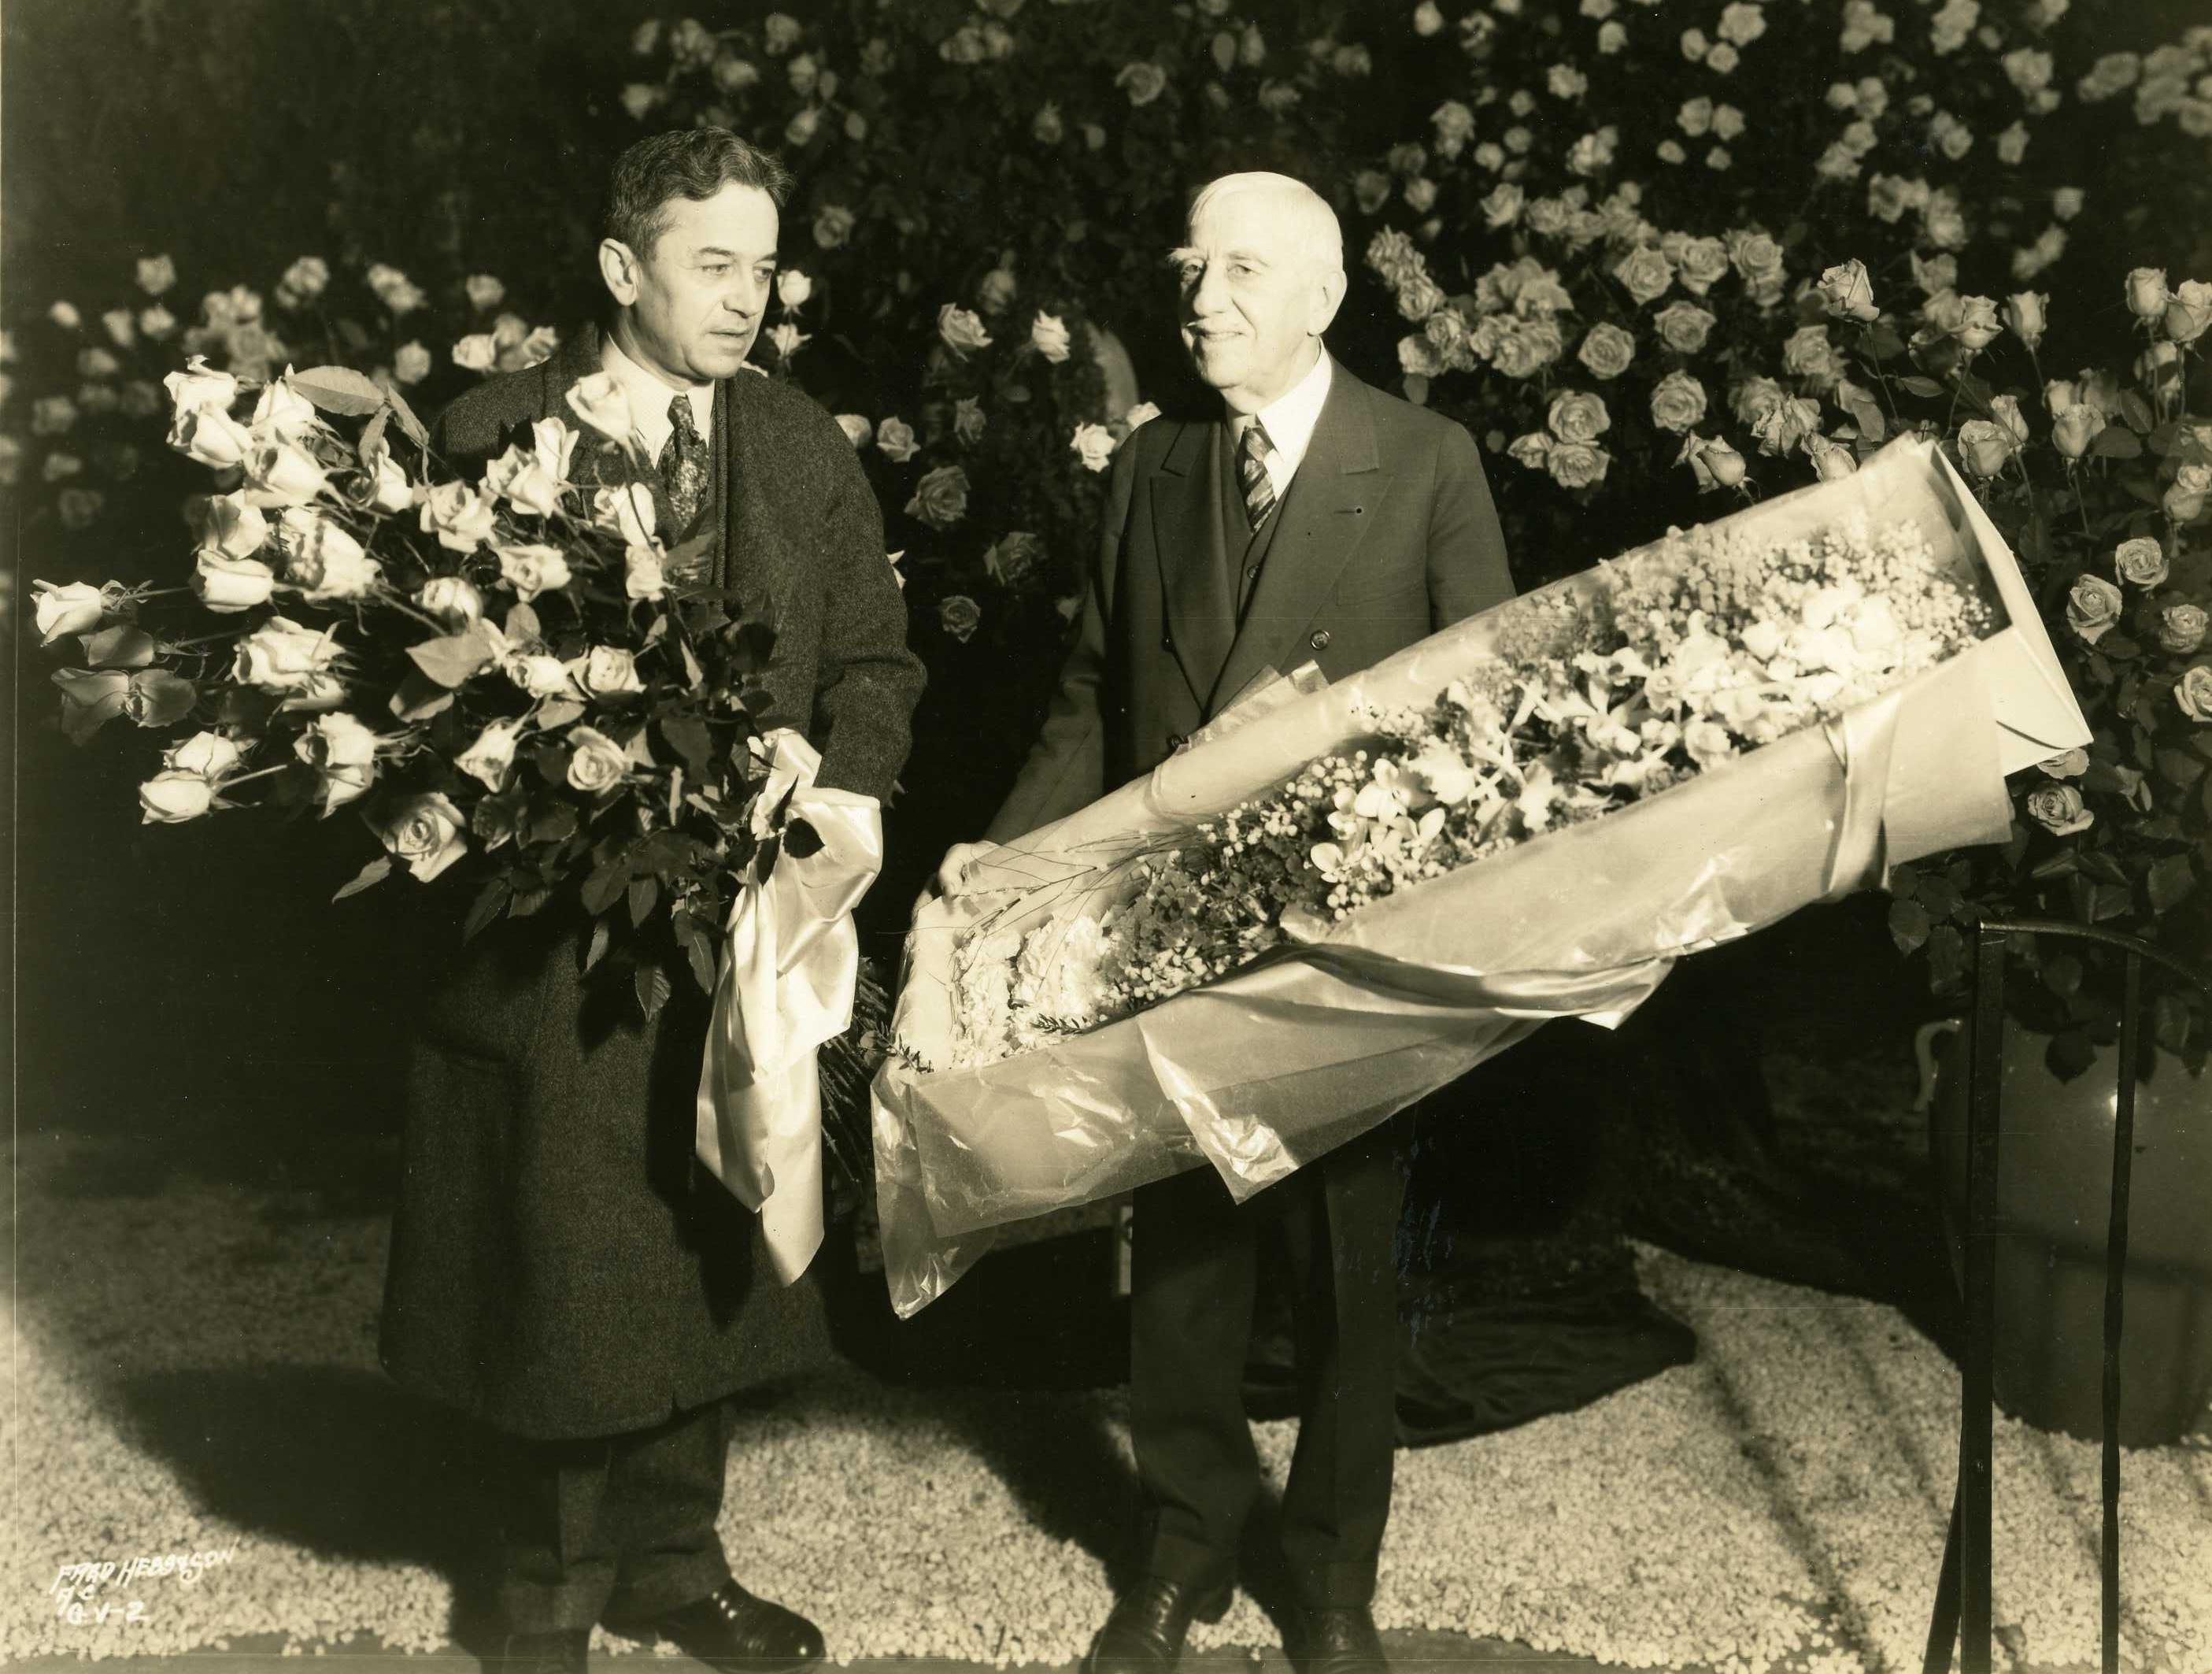 Flowers for Eleanor Roosevelt in 1933 at the Philadelphia Flower Show.